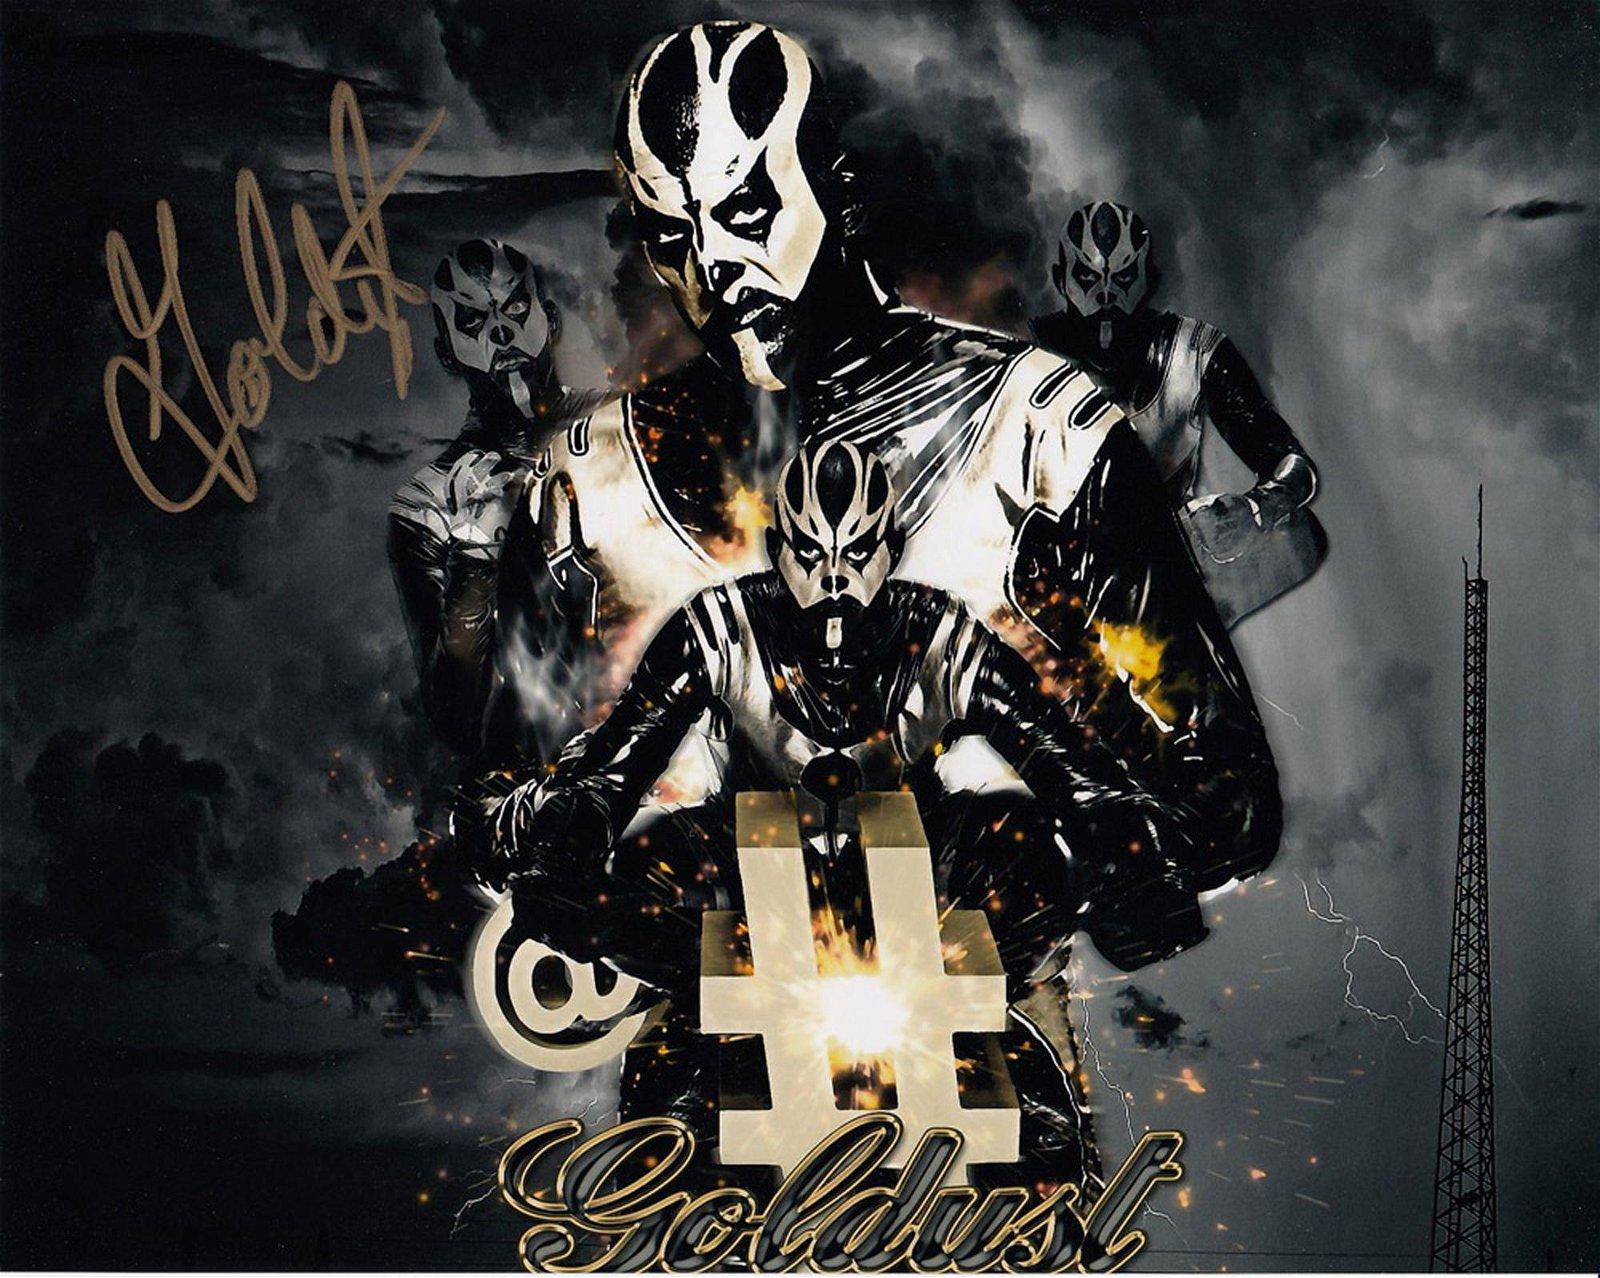 Blowout Sale! WWE WWF Goldust hand signed 10x8 photo.